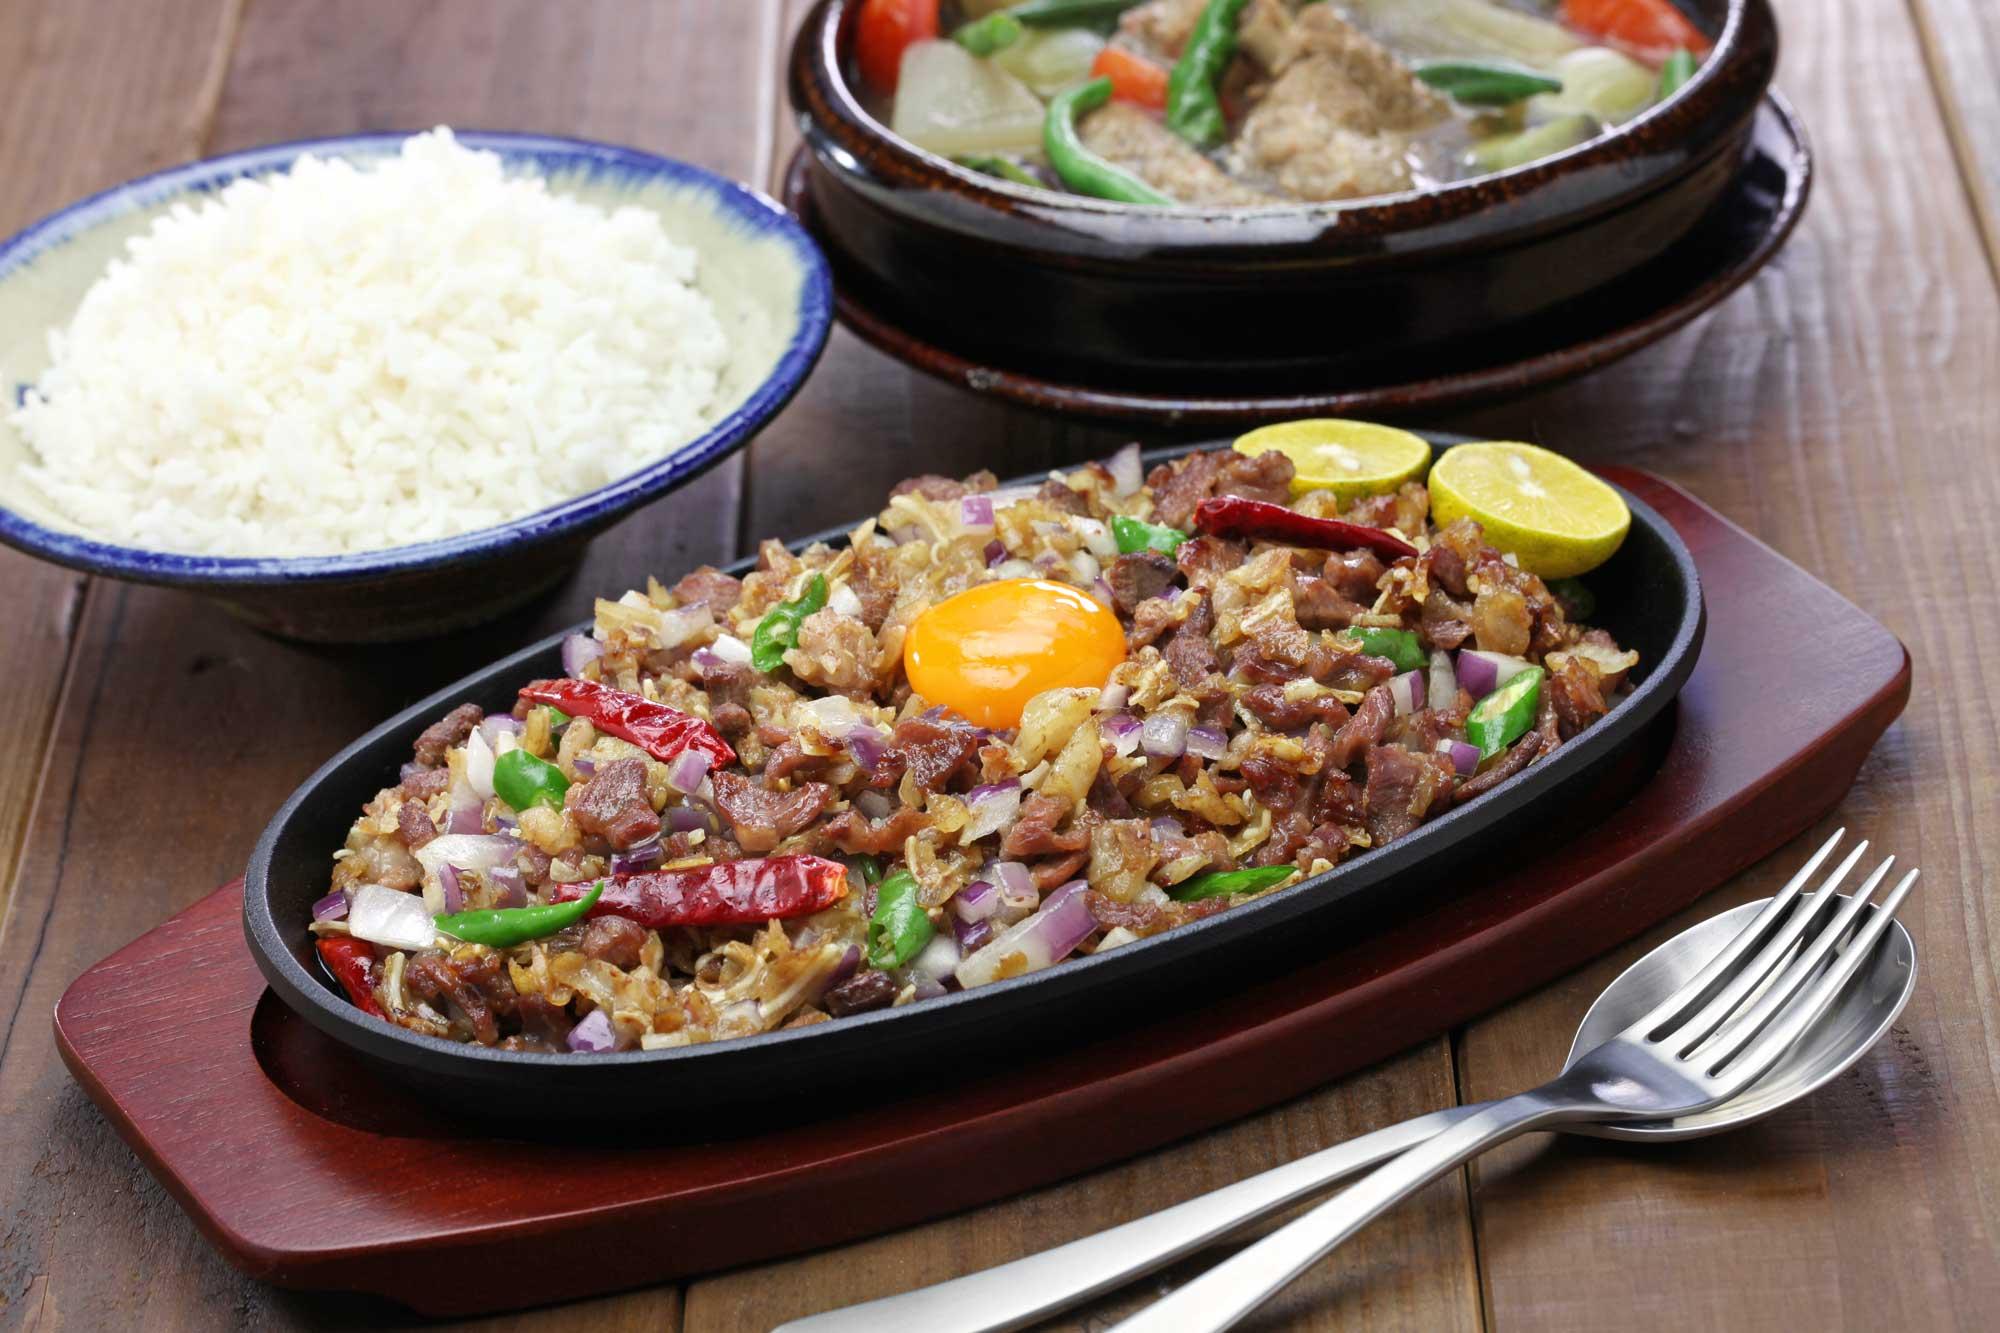 Table Full of Filipino Food Staples